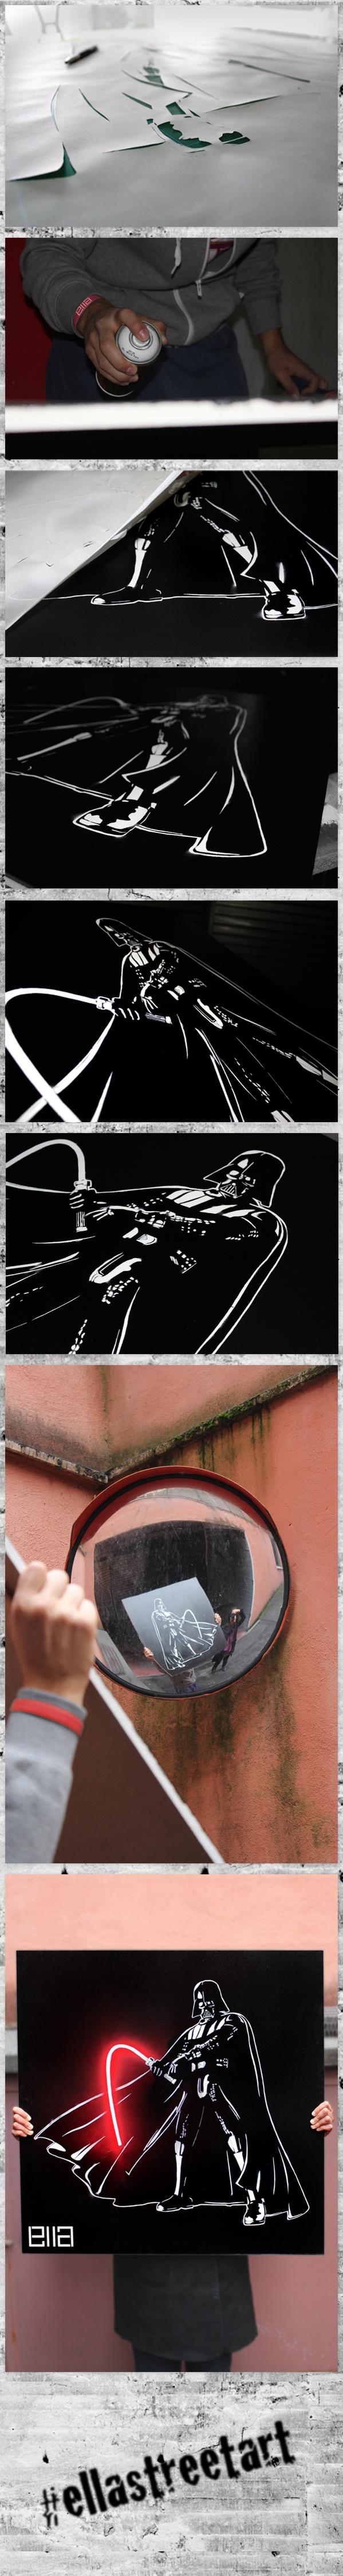 Darth Vader Off // LImpotenza Nera by Ella , via Behance